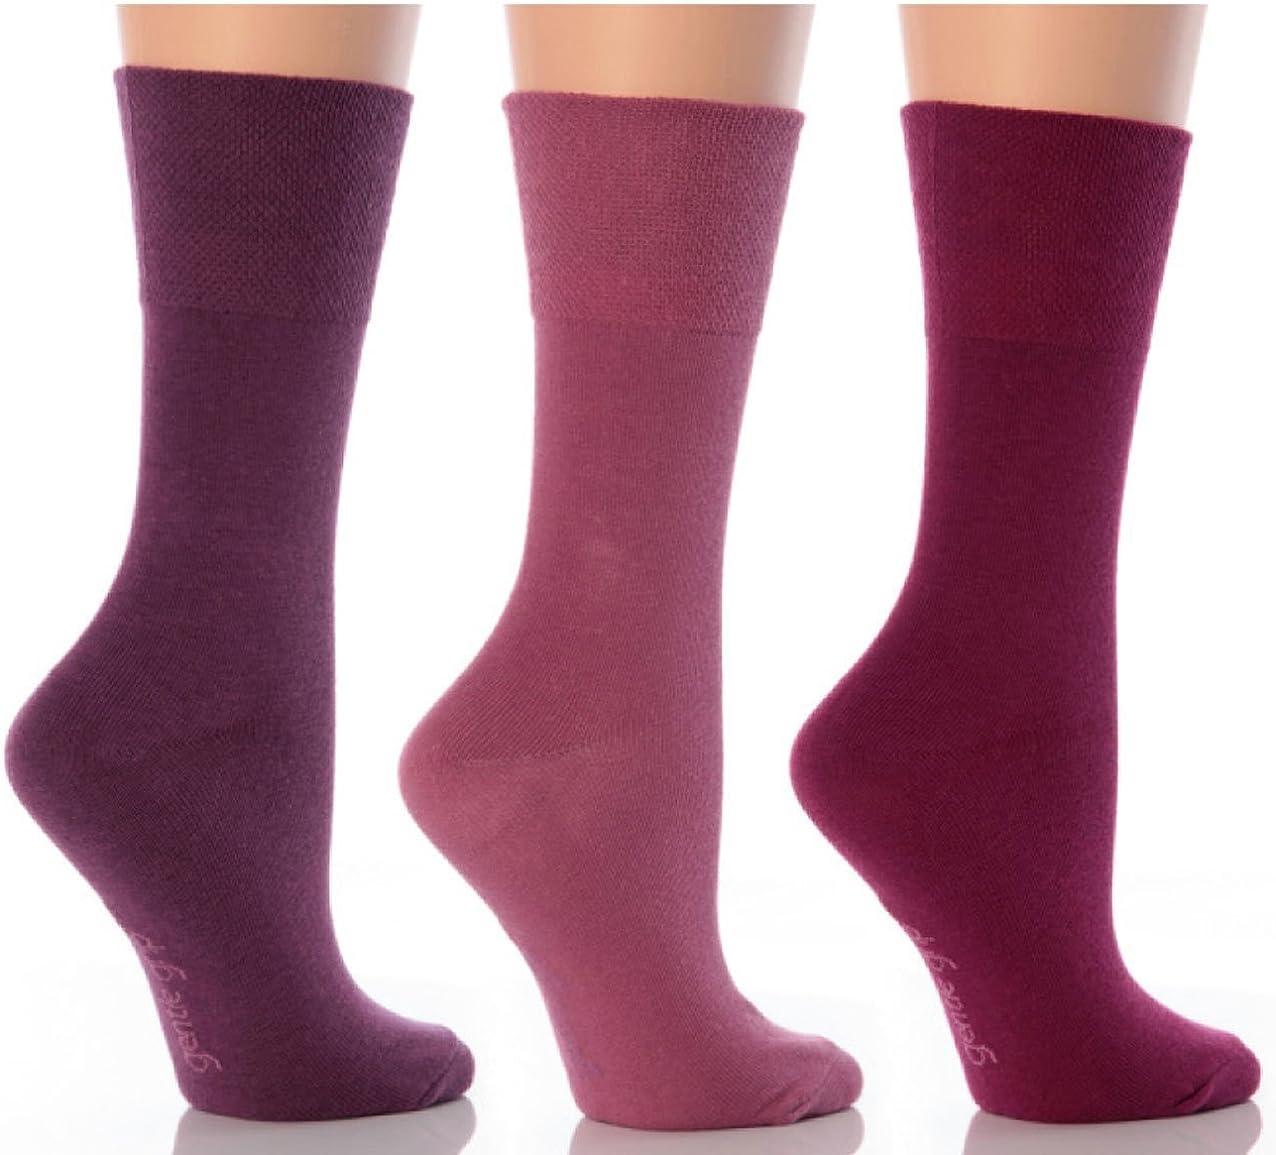 6 Pairs Womens Sockshop Cotton Gentle grip socks 4-8 uk 37-42 eu Argyles